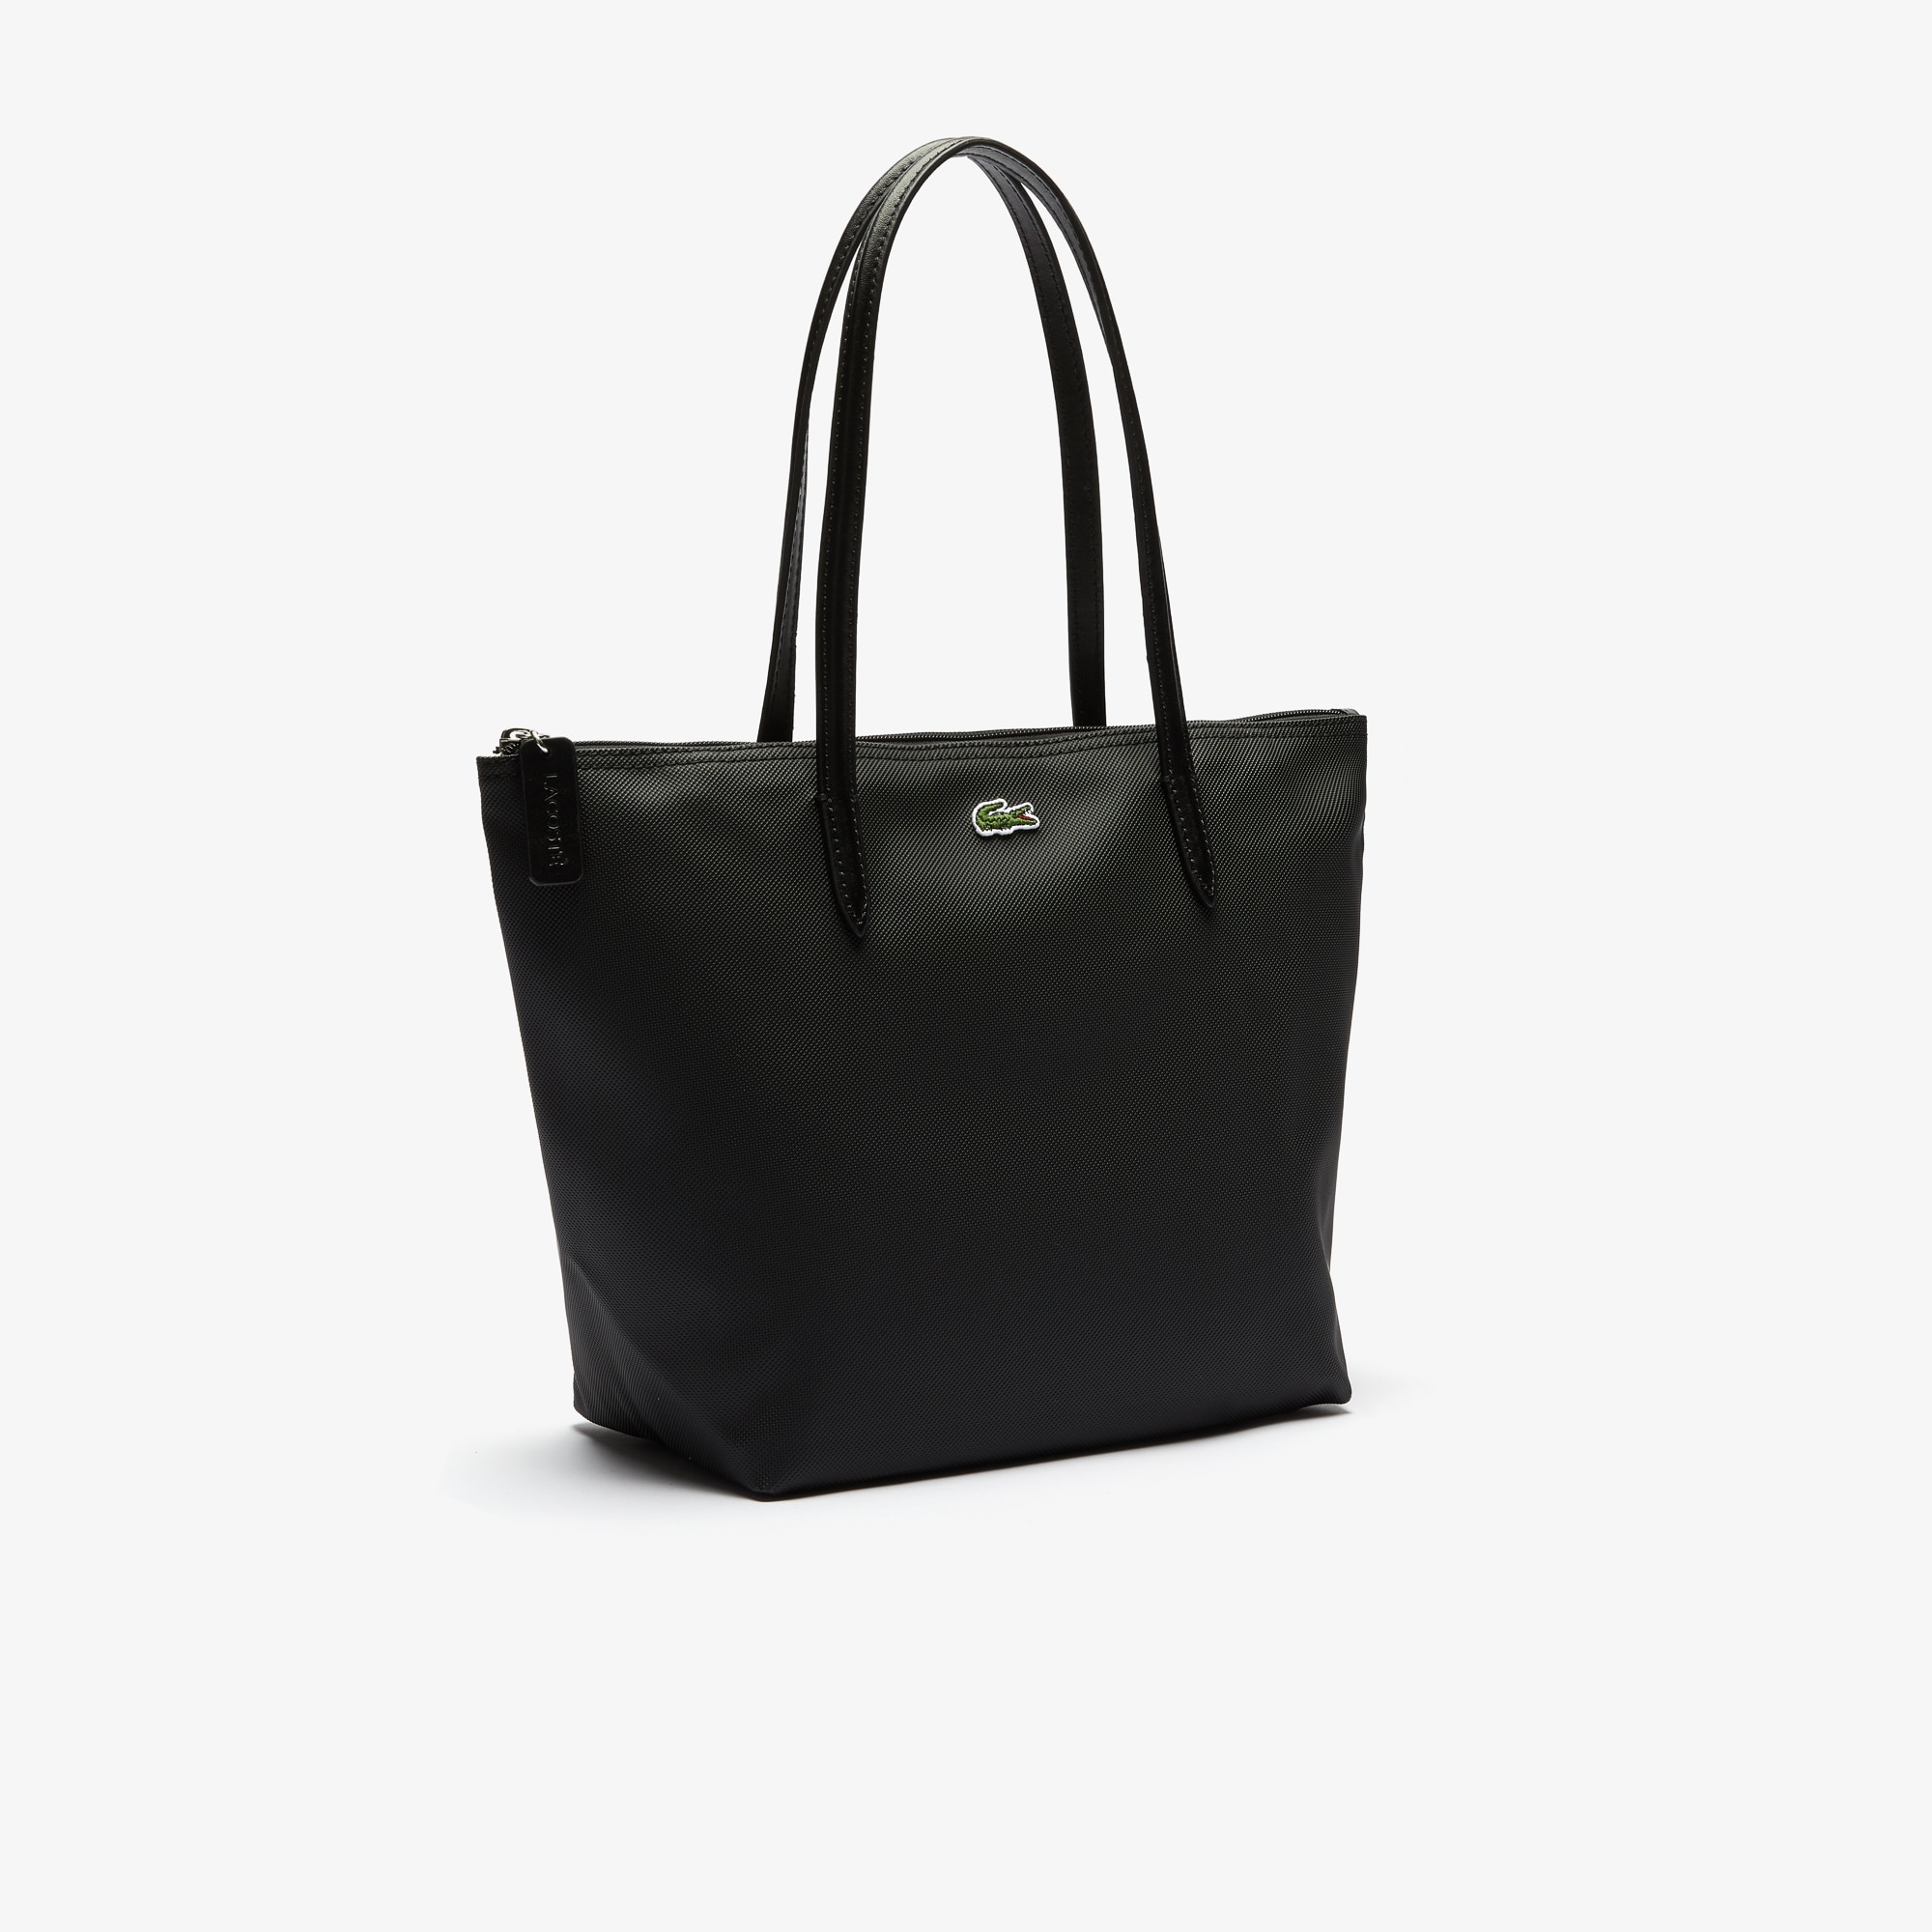 0b6a4bb08 Women's L.12.12 Small Tote Bag | LACOSTE